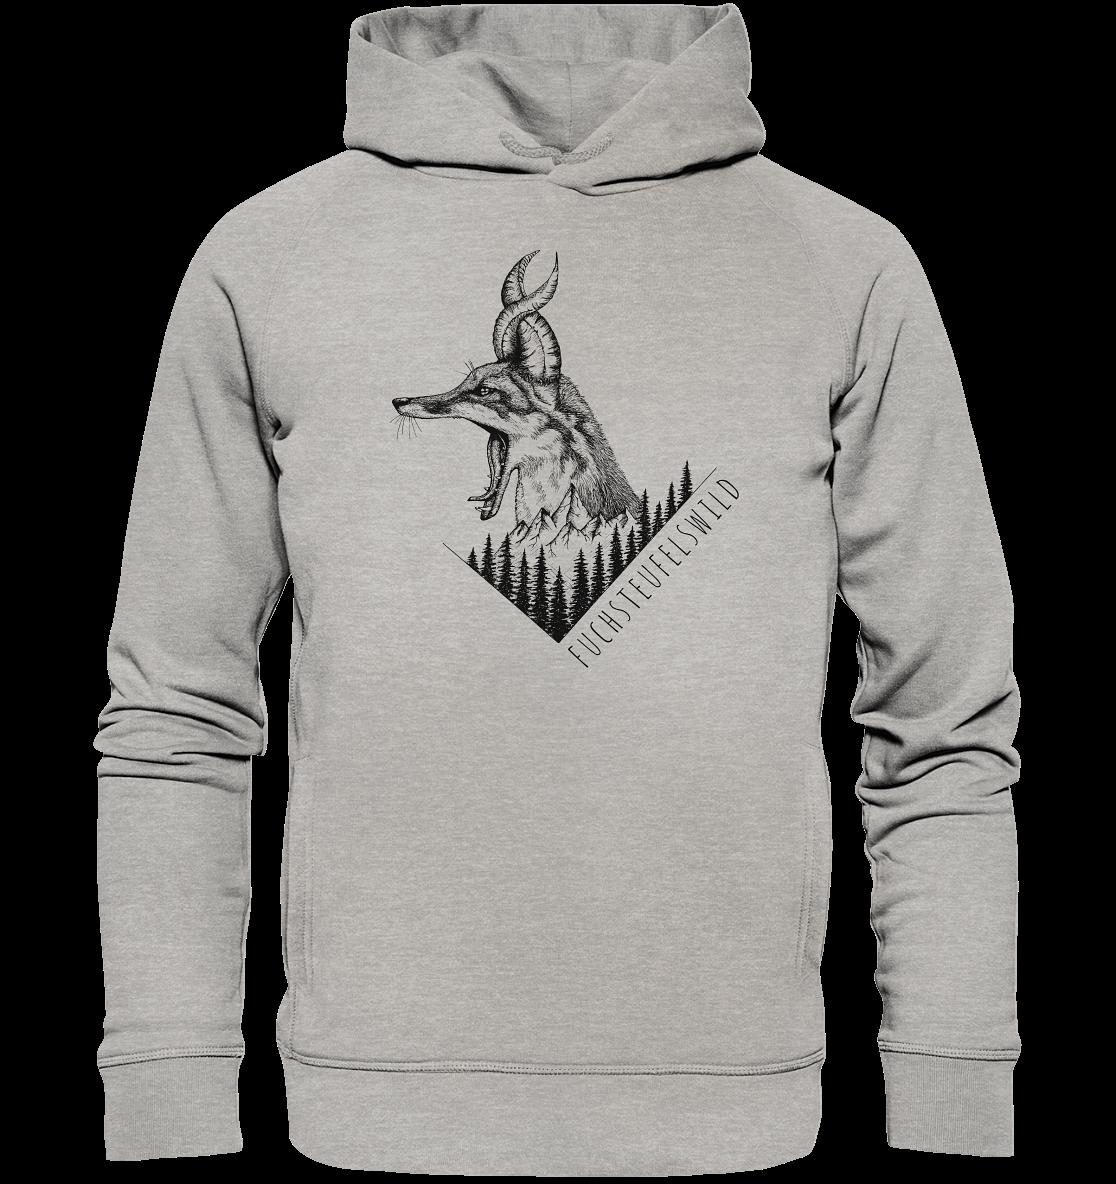 front-organic-fashion-hoodie-c2c1c0-1116x-4.png